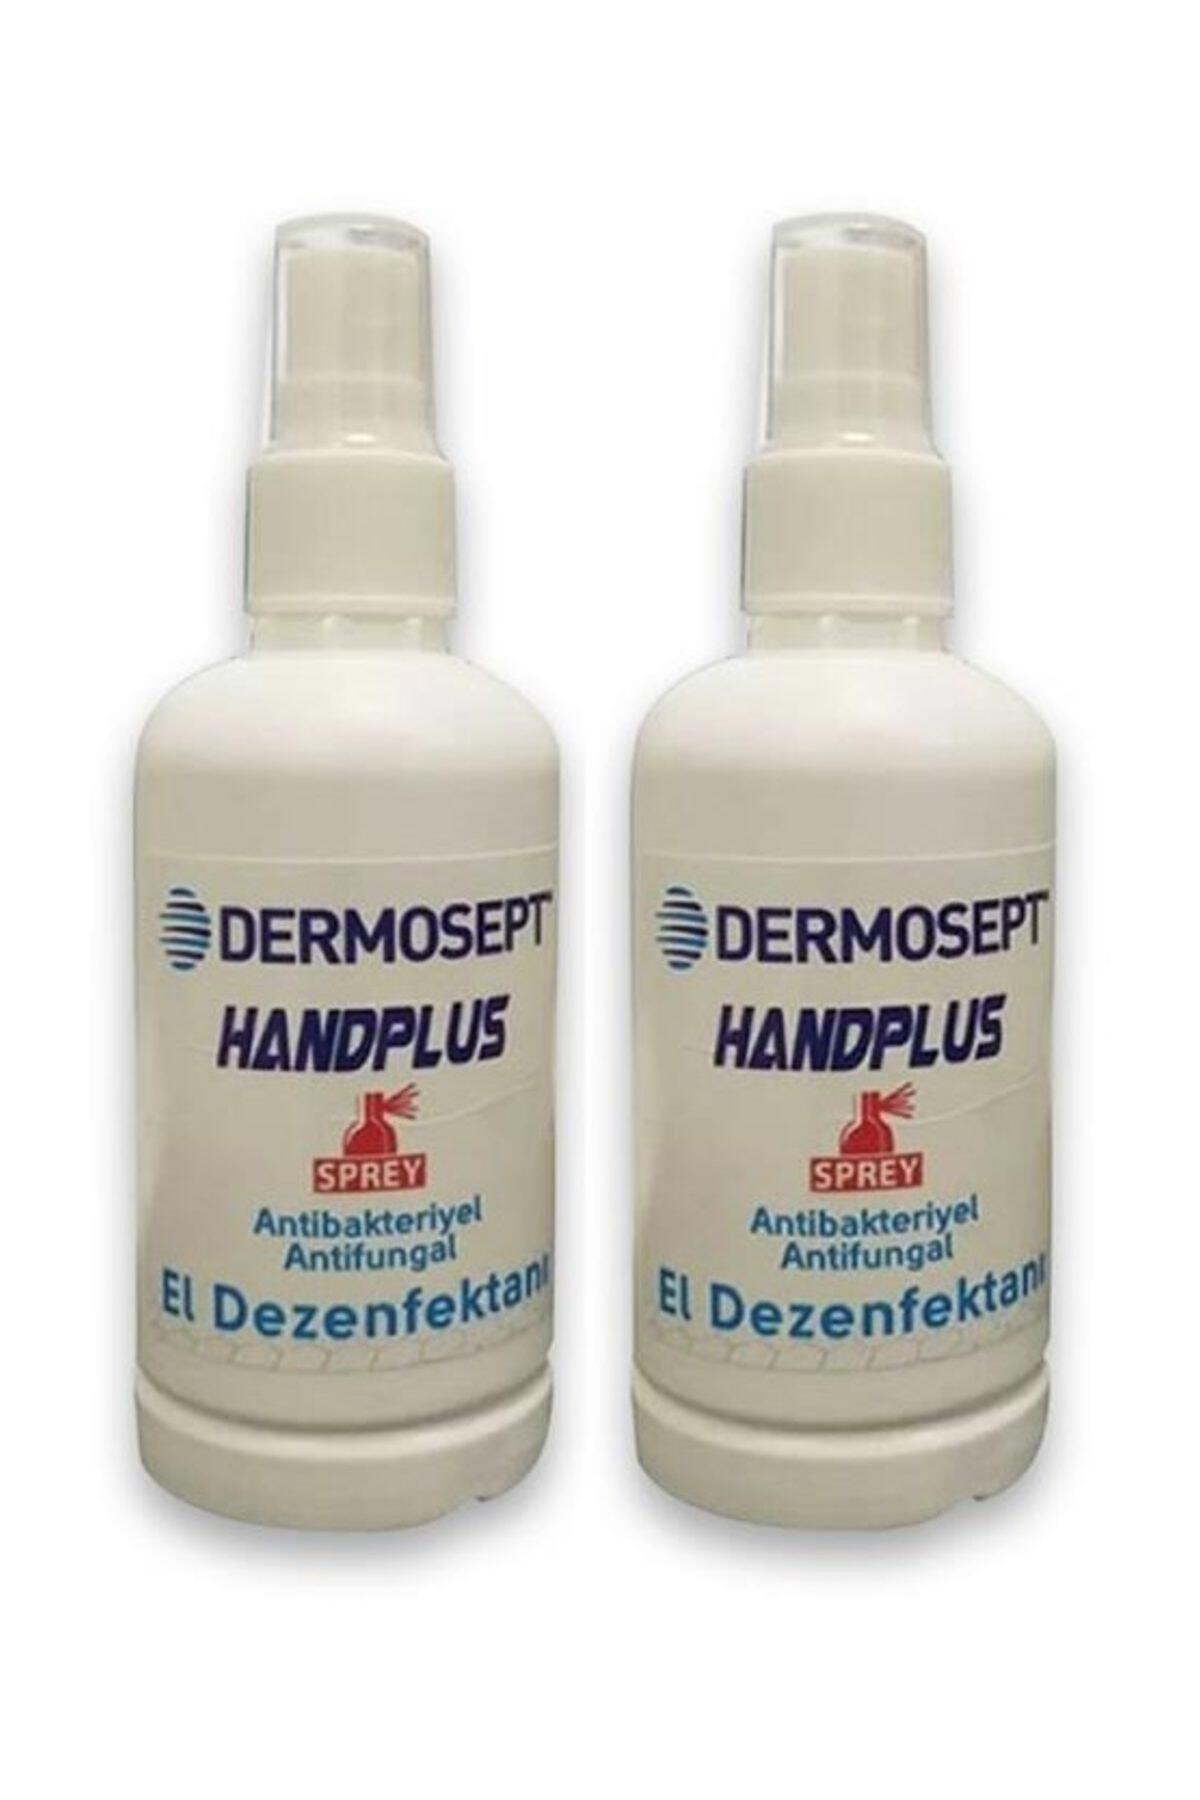 dermosept handplus antibakteriyel el